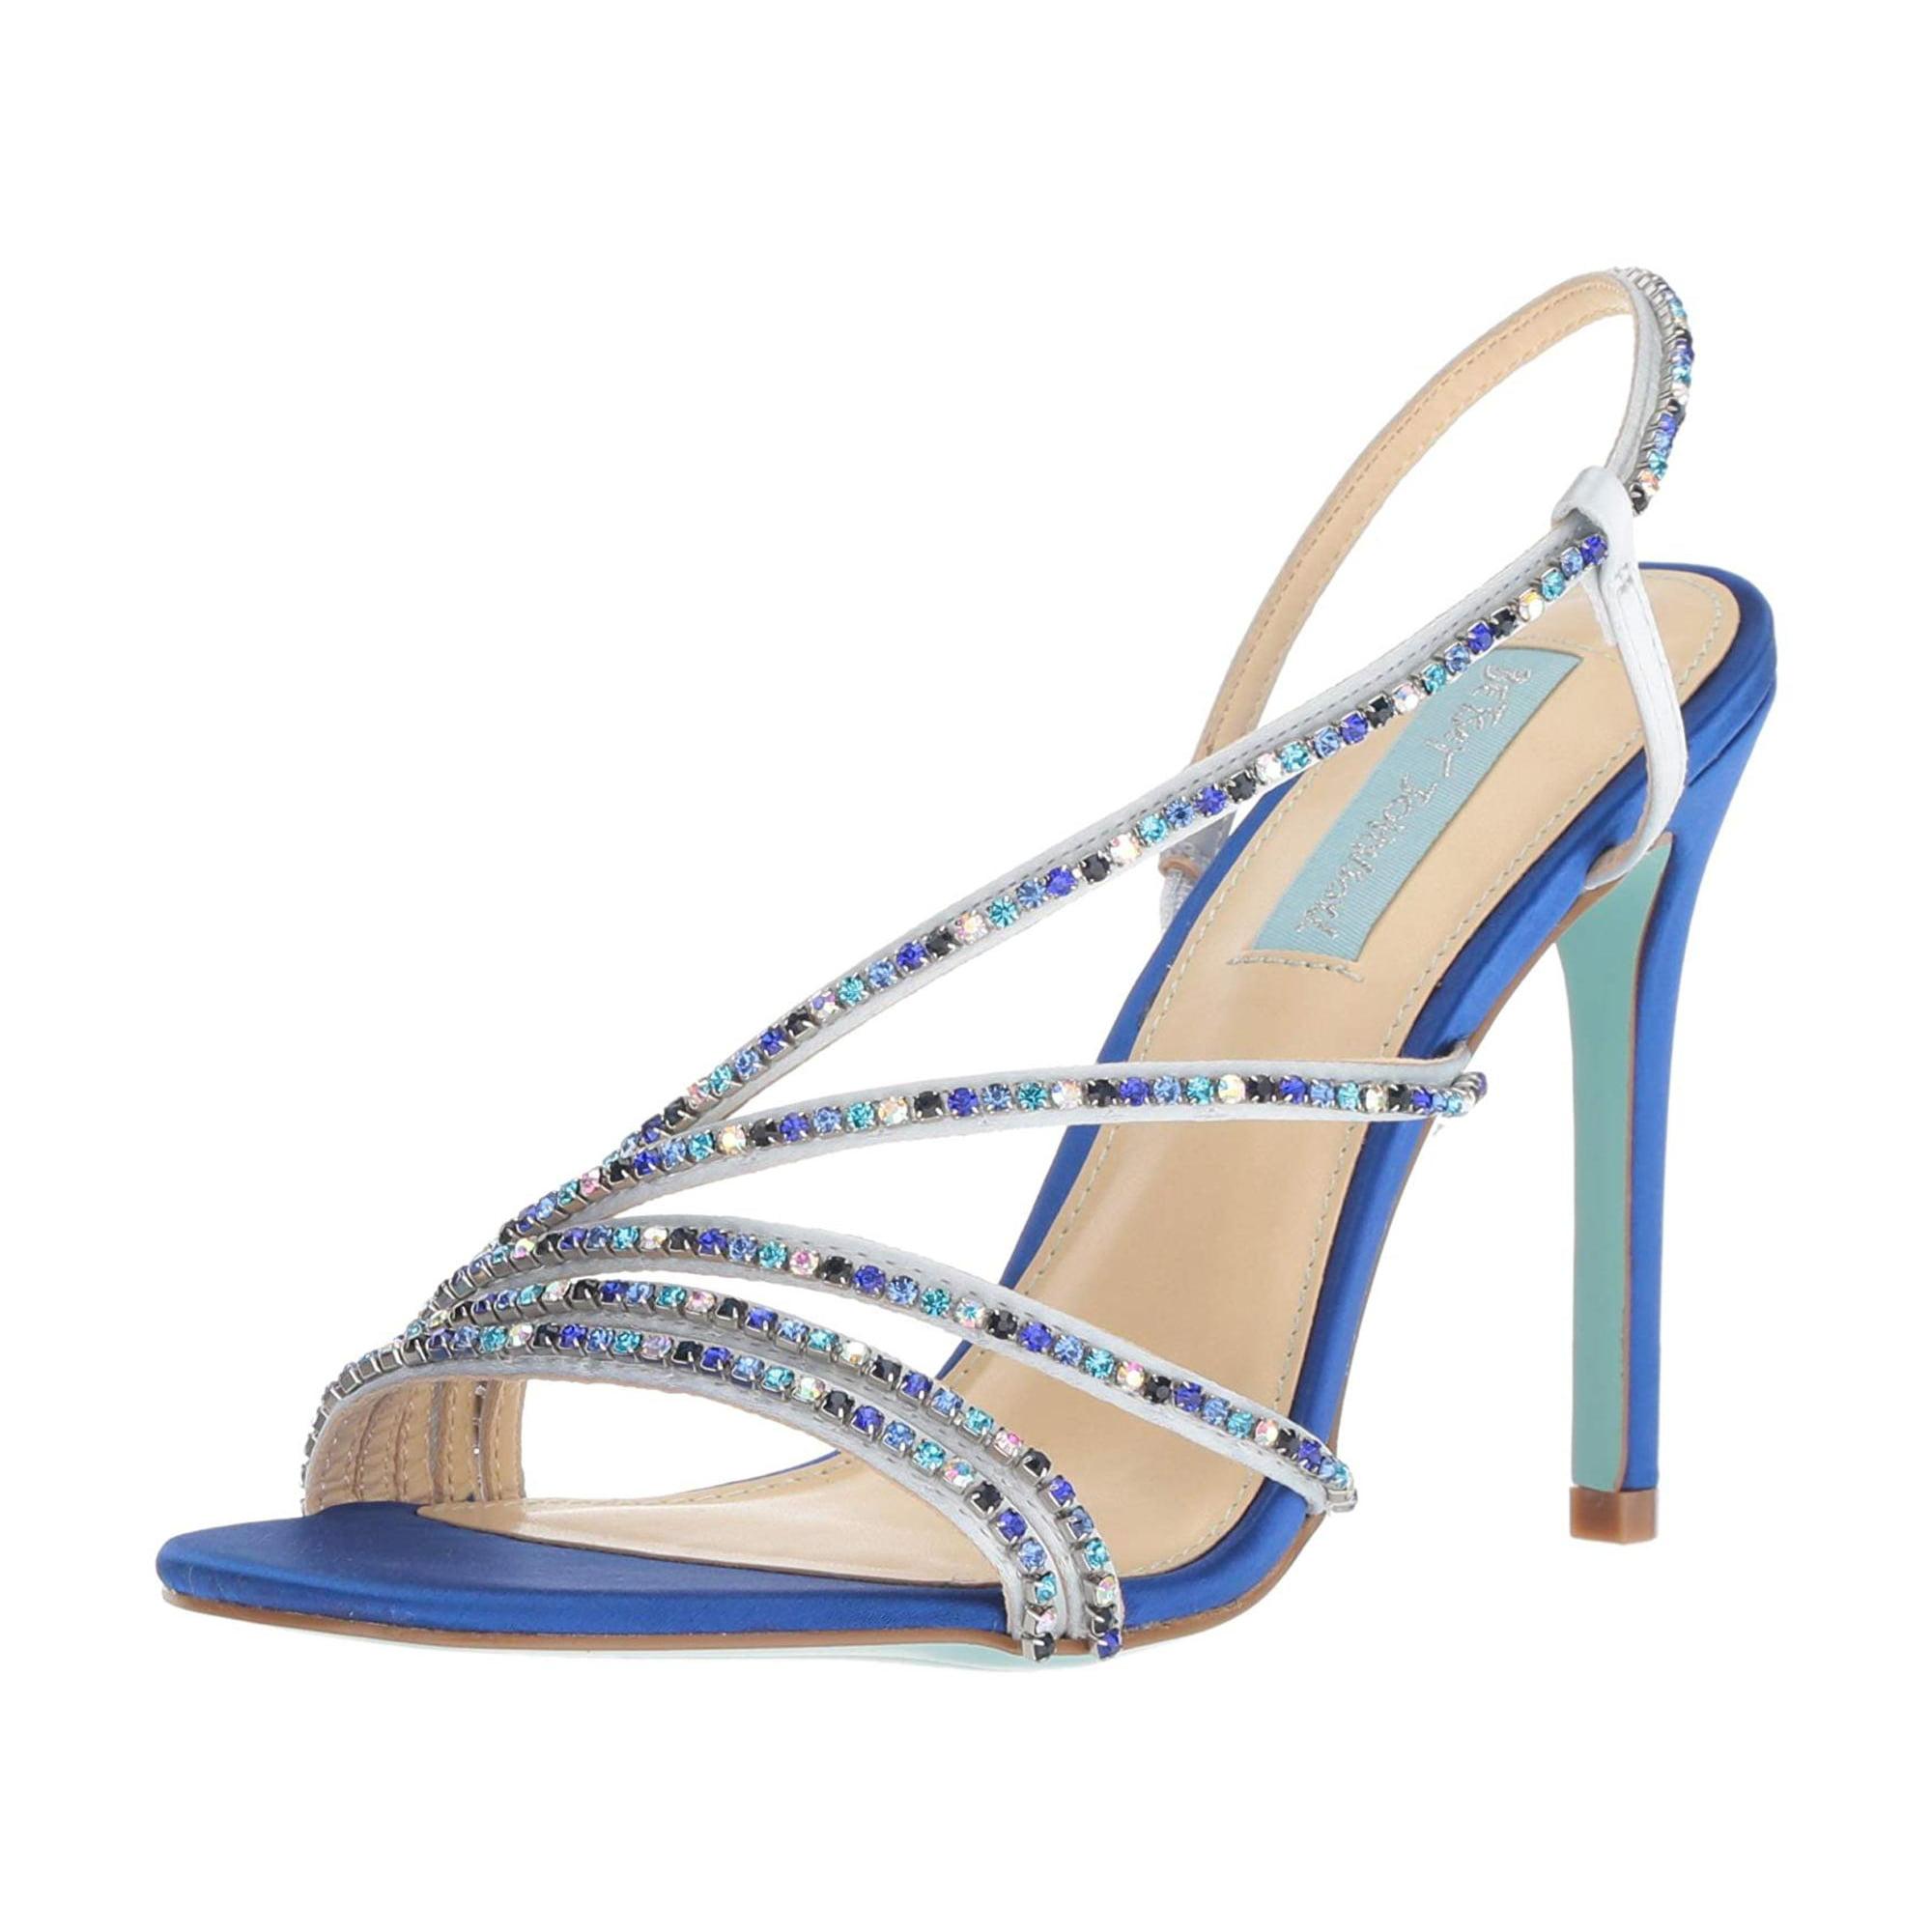 45317e6da Blue by Betsey Johnson Women s Sb-aces Heeled Sandal